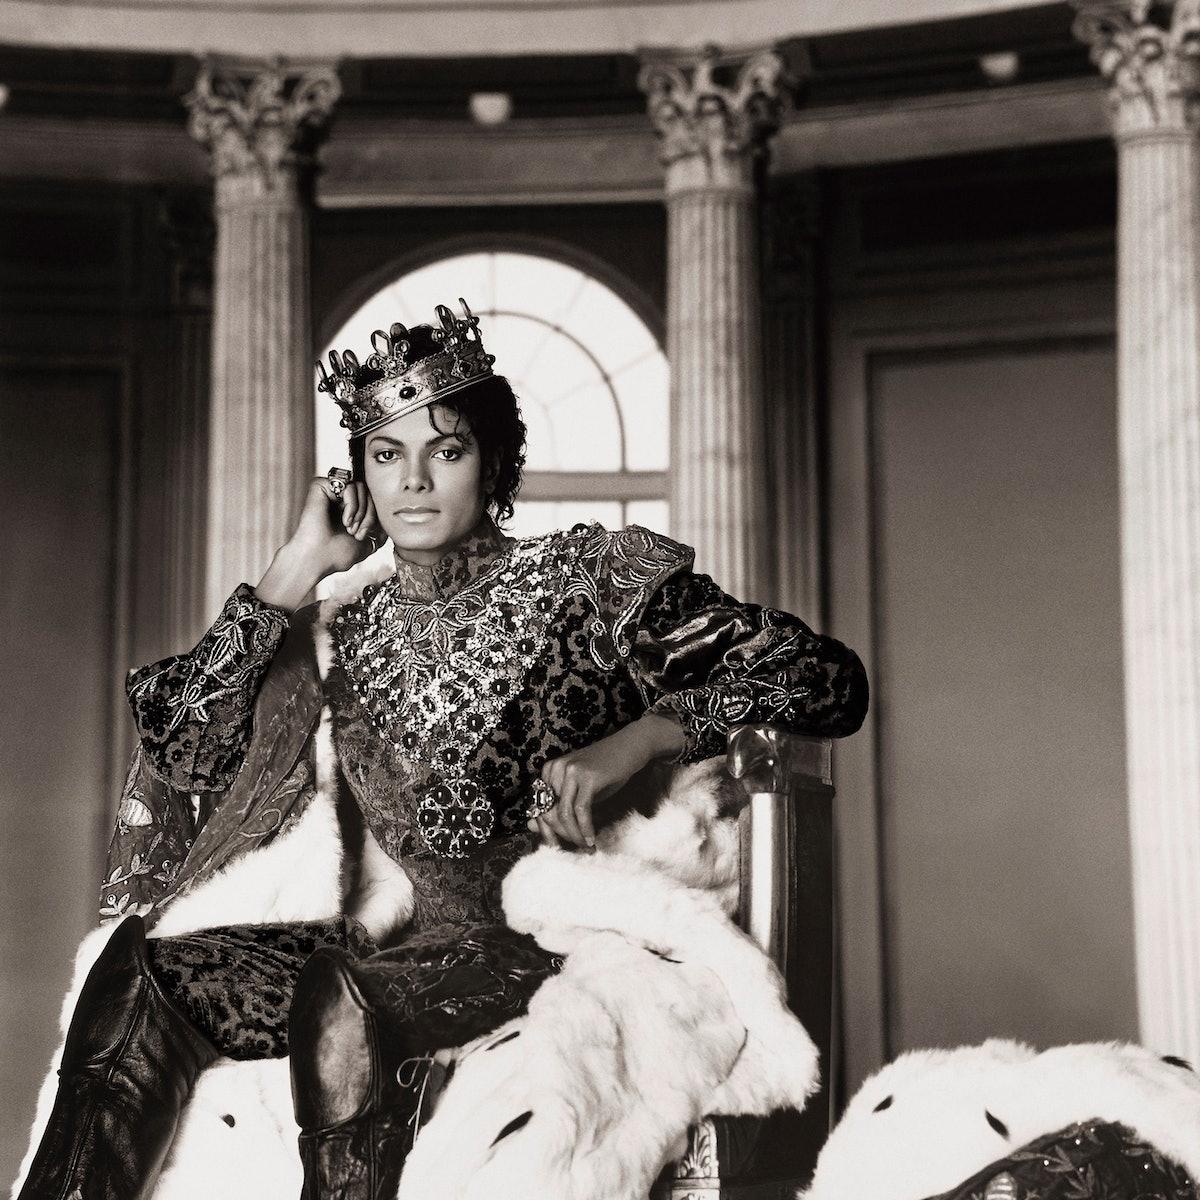 003 Michael Jackson King.jpg